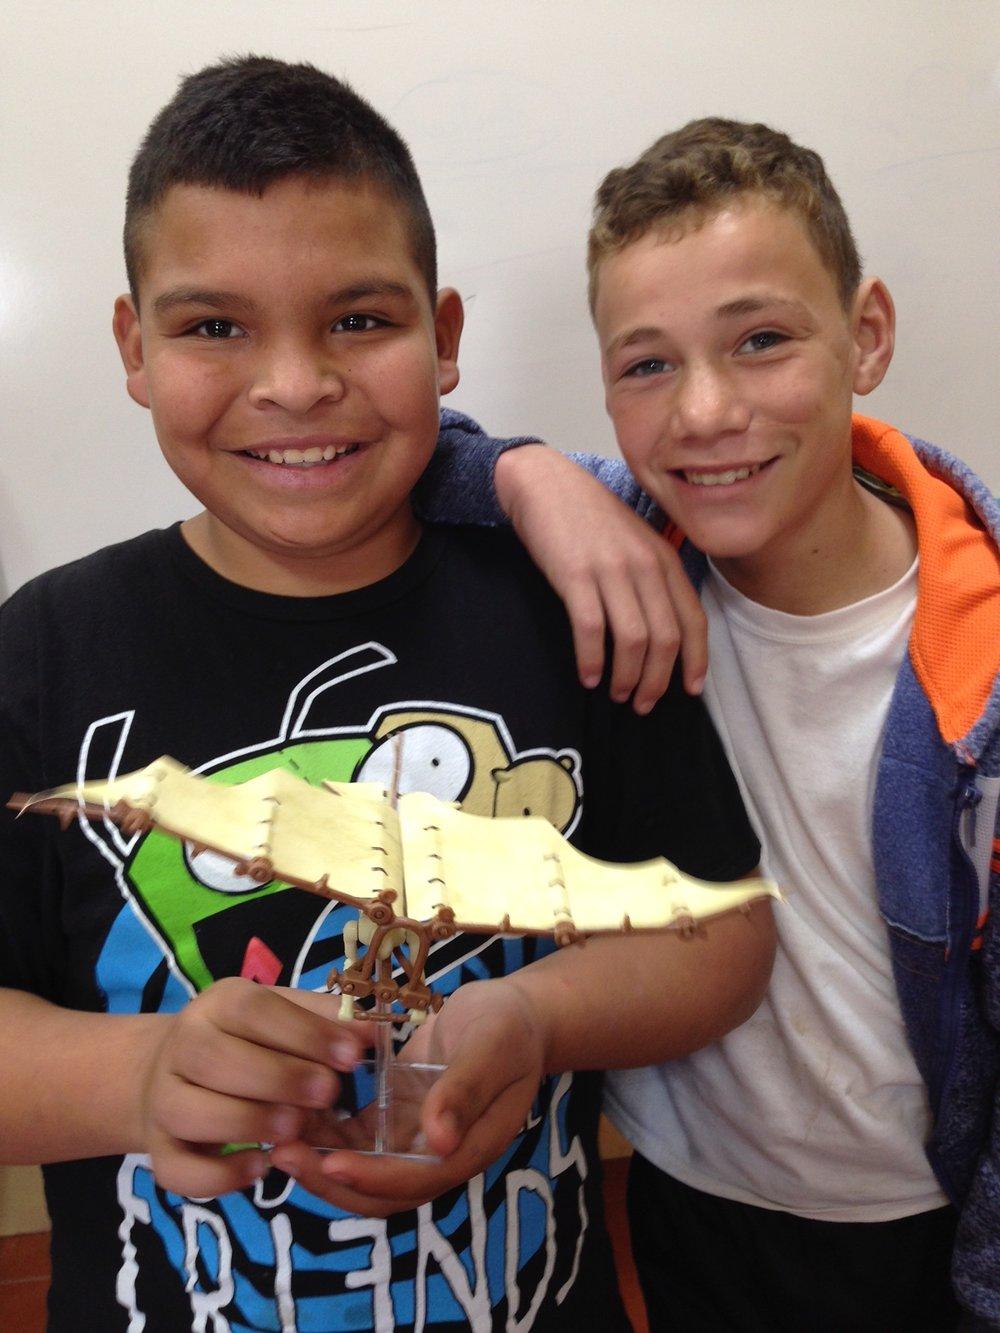 school-buddies-crafting-classroom-2017-pals.JPG